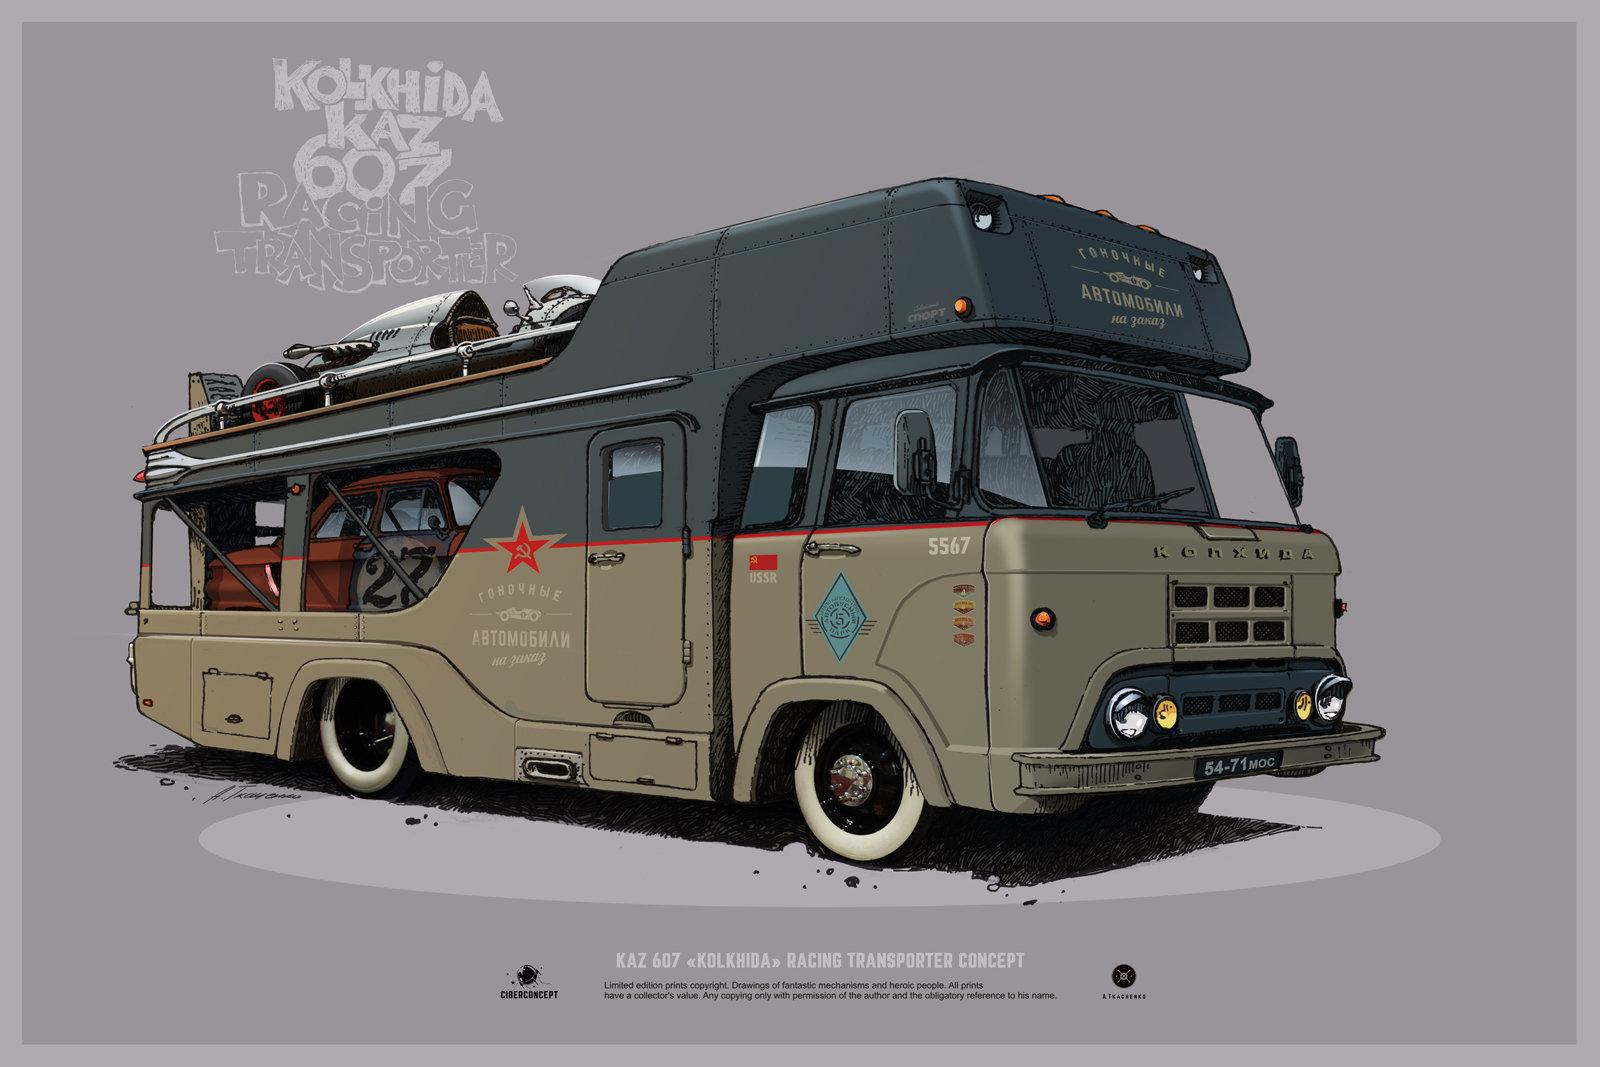 andrey-tkachenko-kolkhida-racing-transport-print